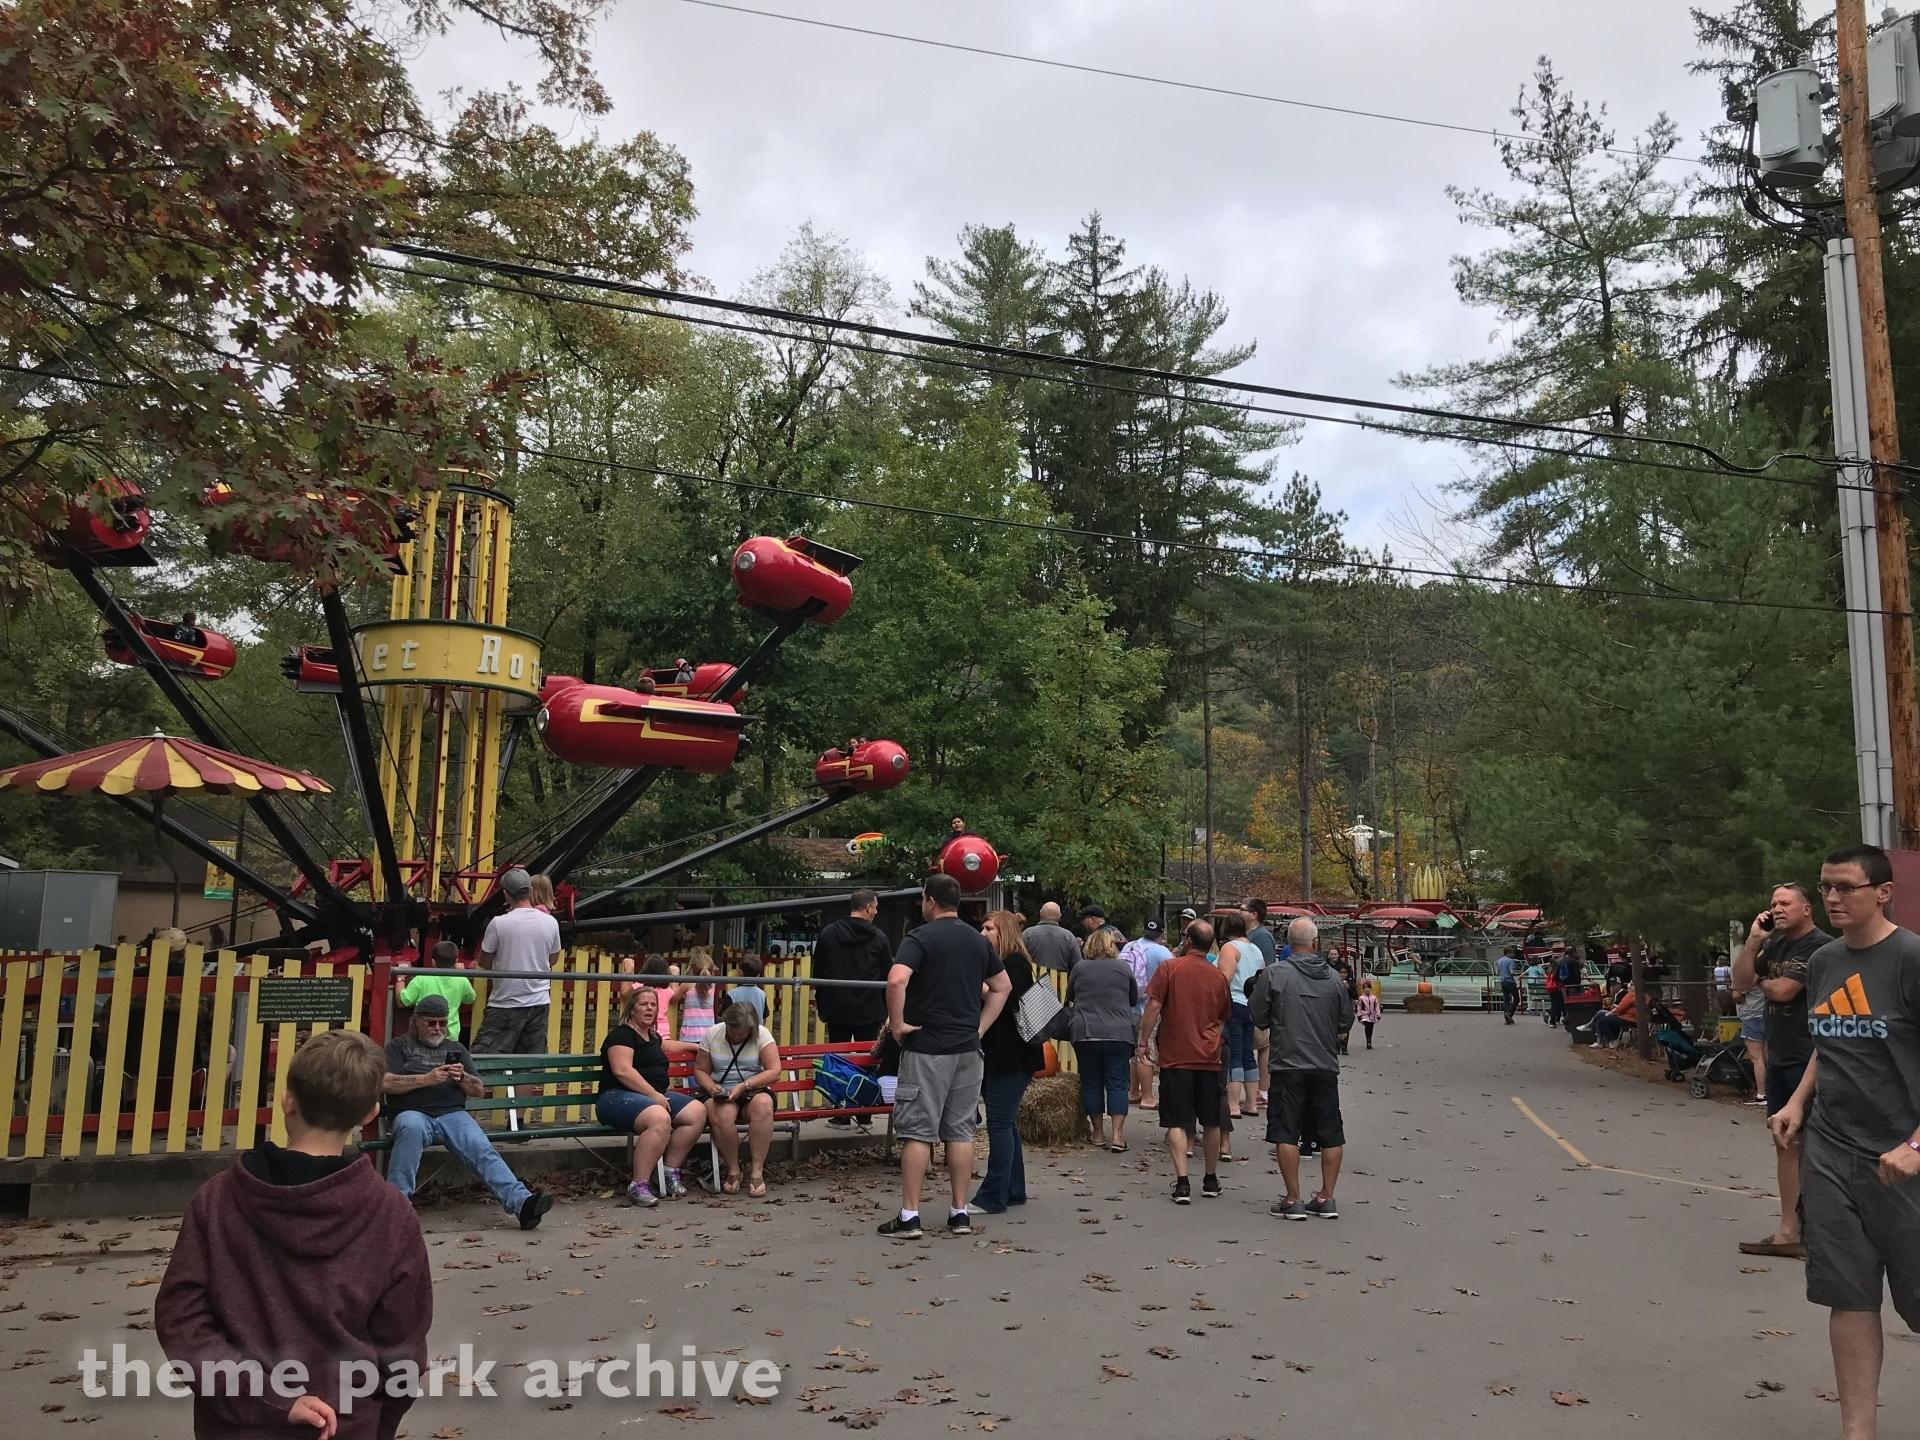 Roto Jets at Knoebels Amusement Resort